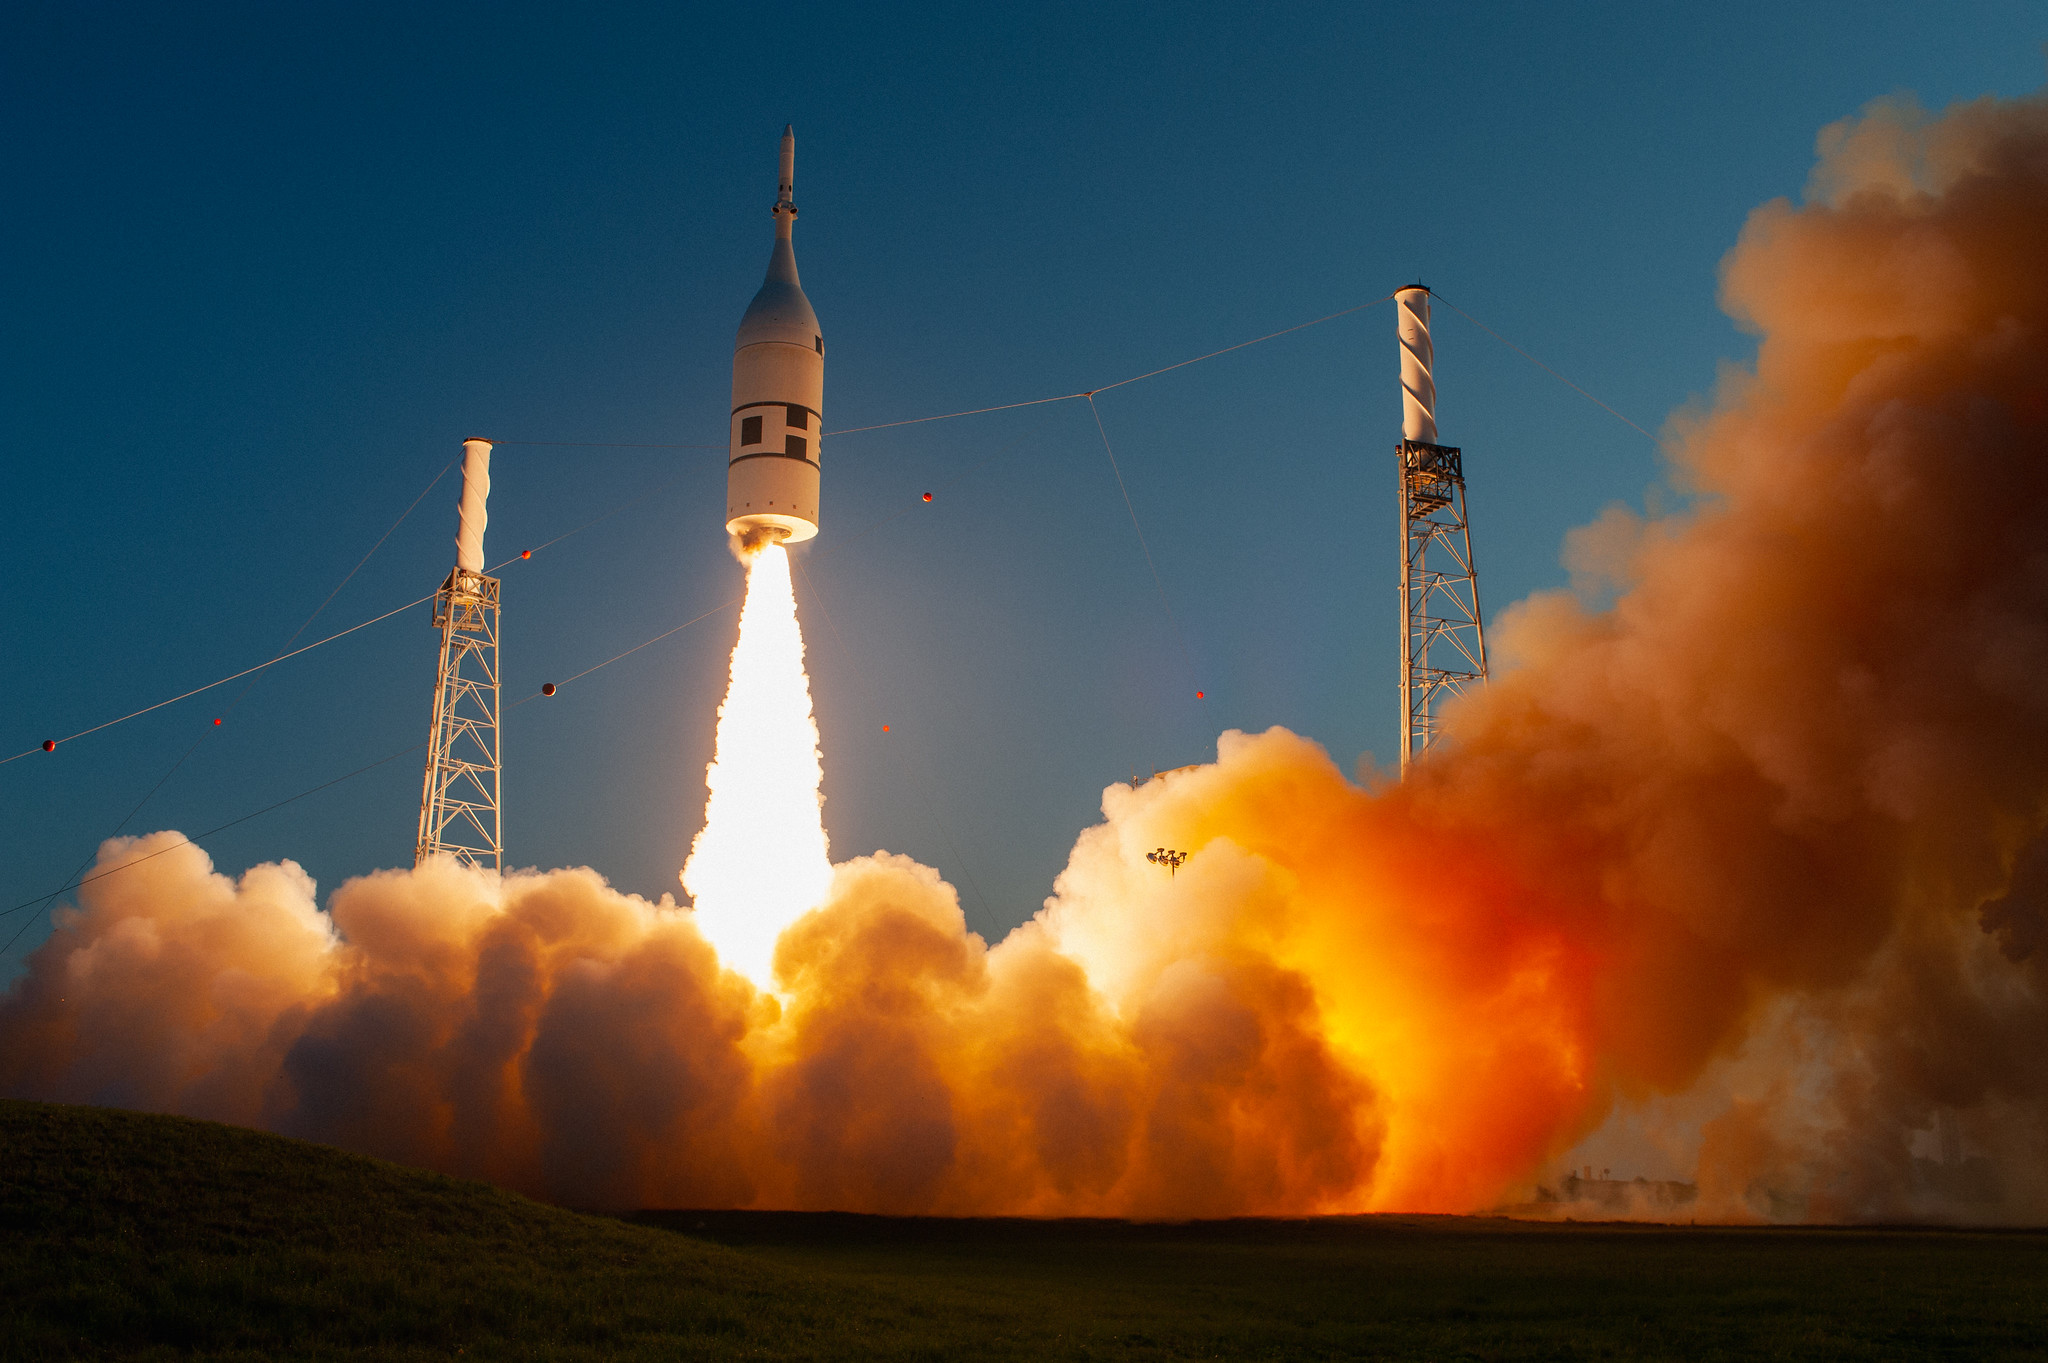 NASA's InSight probe is still struggling to crack the surface of Mars